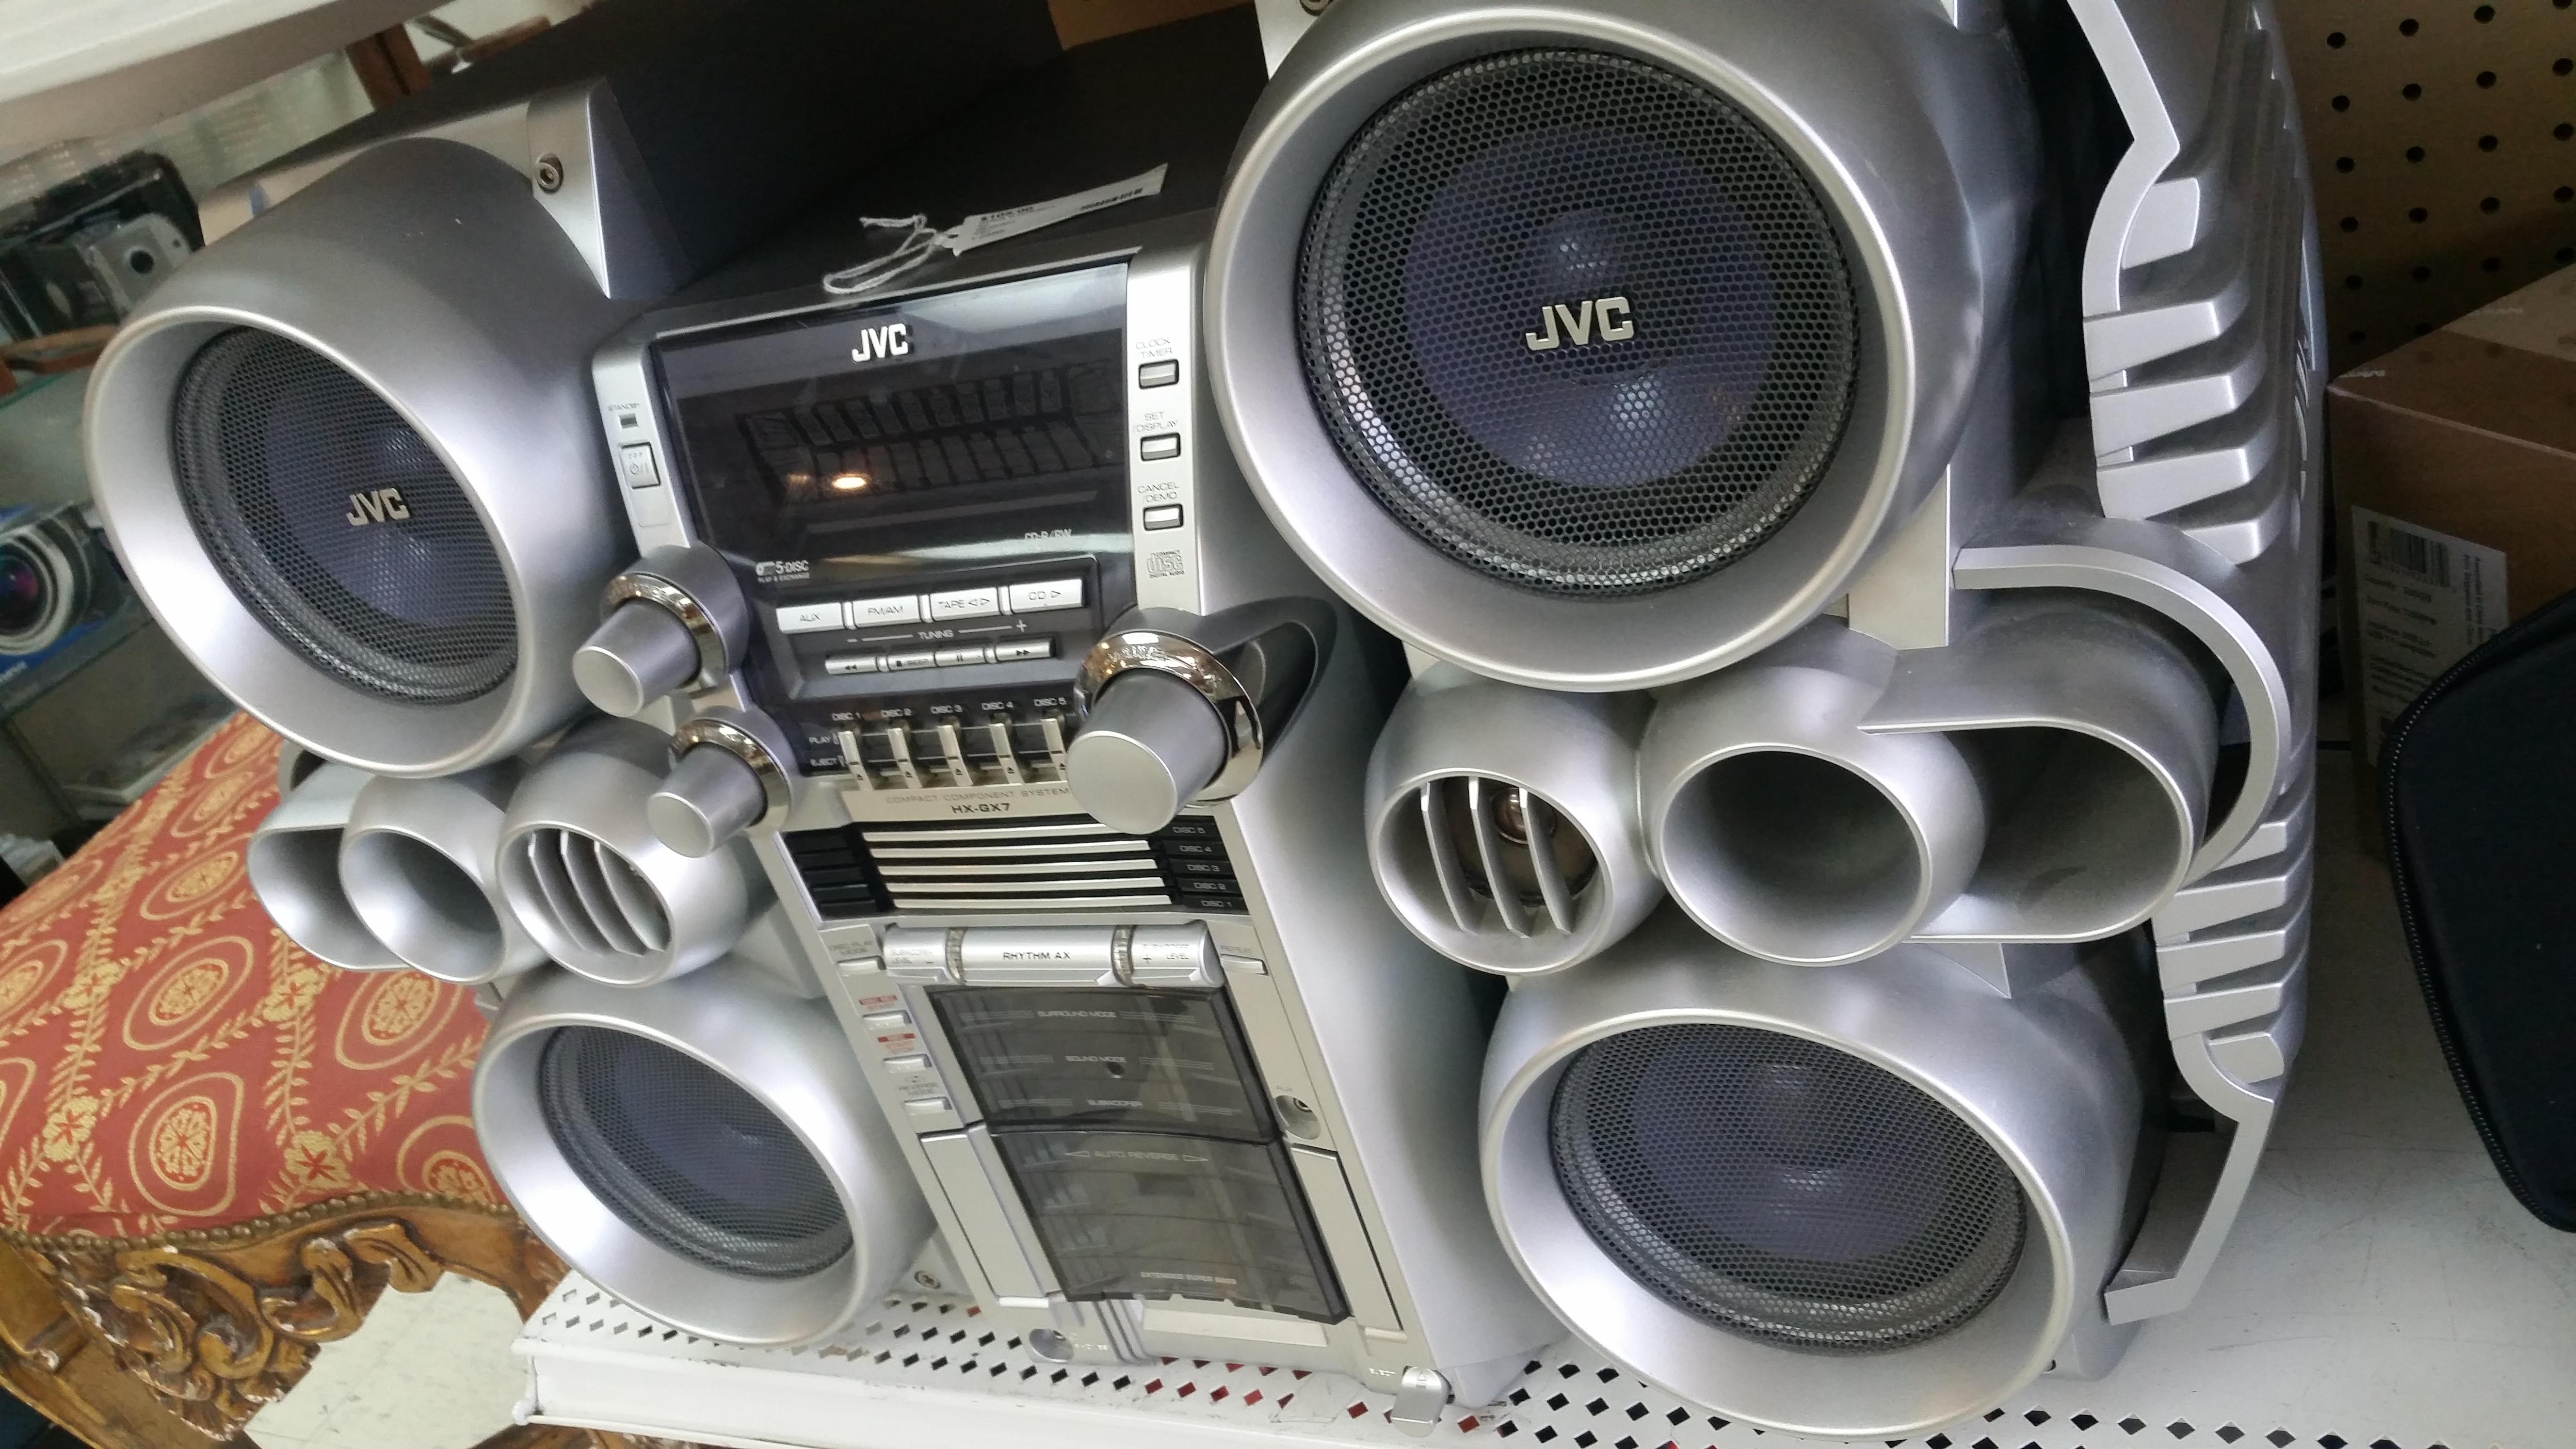 JVC Stereo_1